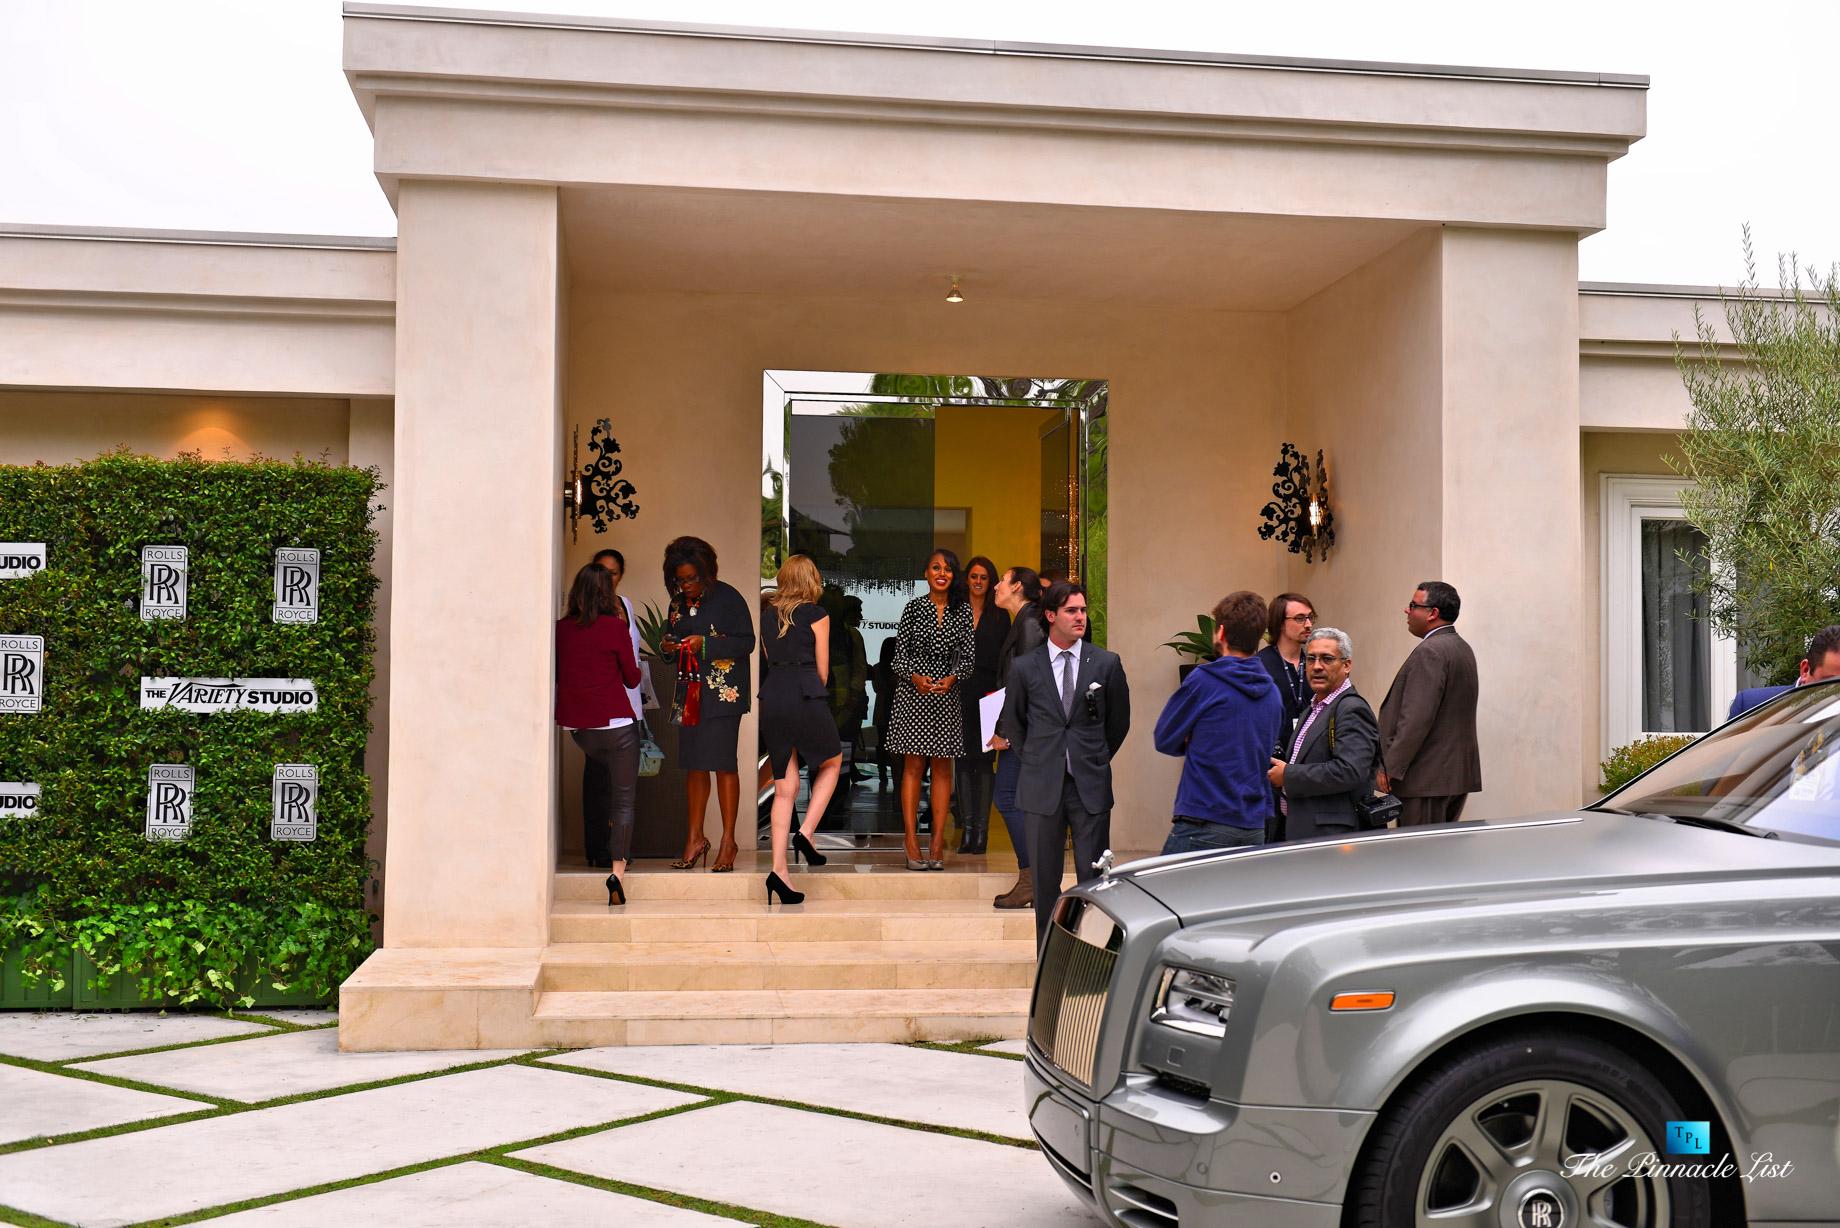 Kerry Washington - Rolls-Royce Hosts The Variety Studio Event in Beverly Hills, California